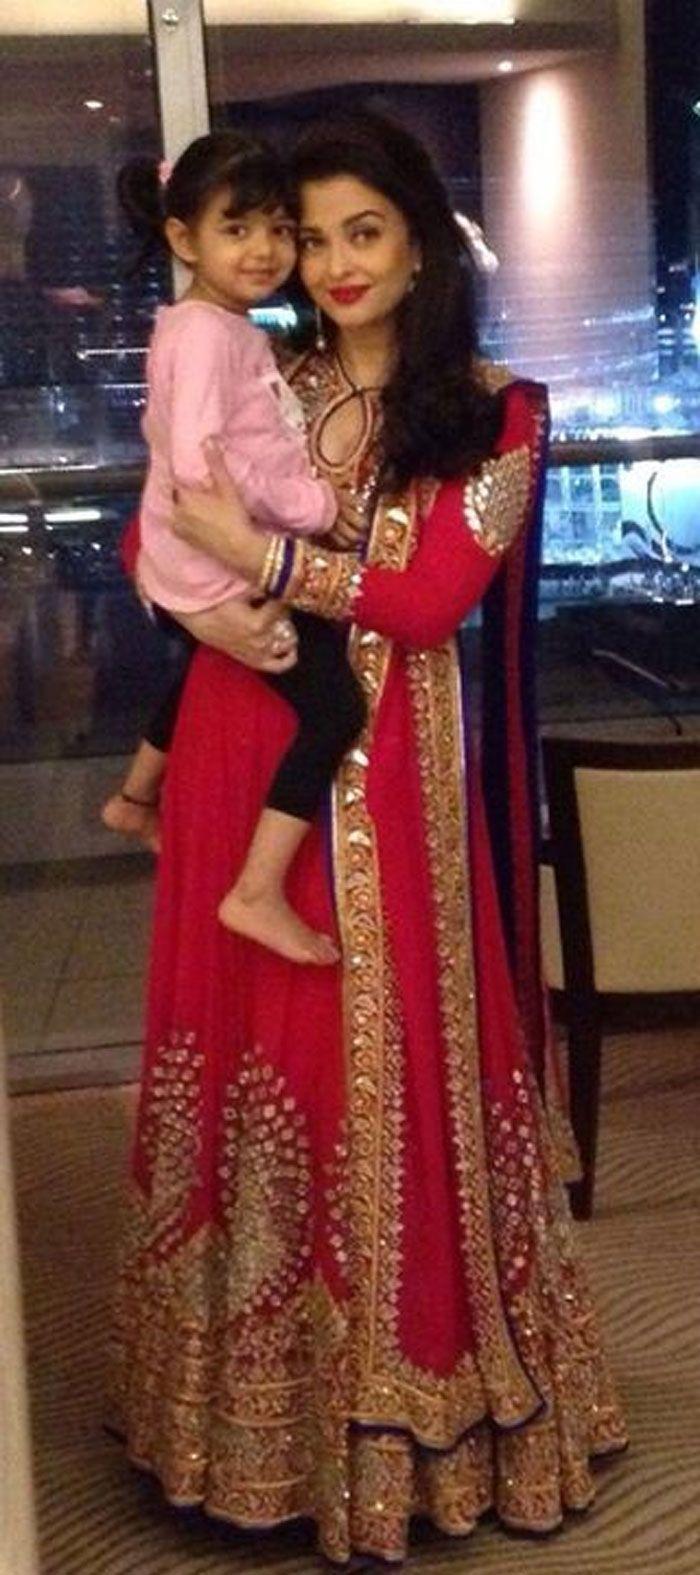 Aishwarya Rai Bachchan And Birthday Girl Aaradhya Were In